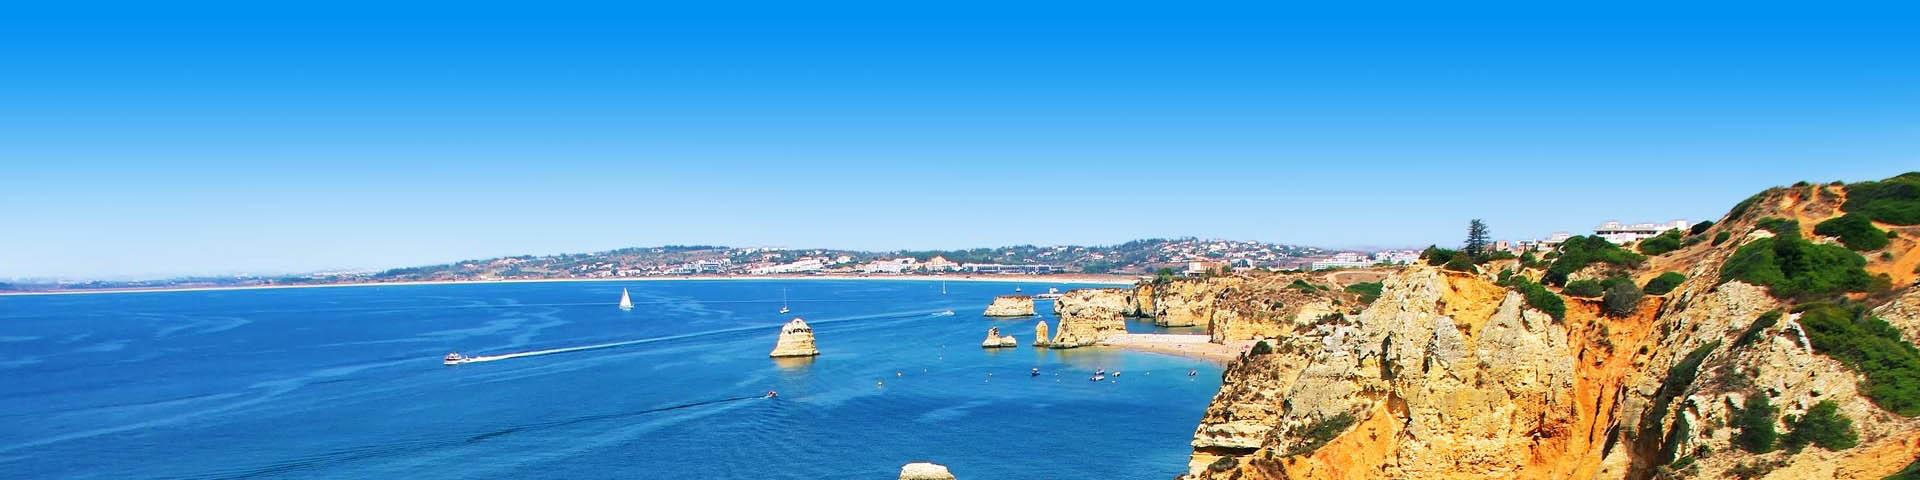 Prachtige rotsachtige kust in Portugal